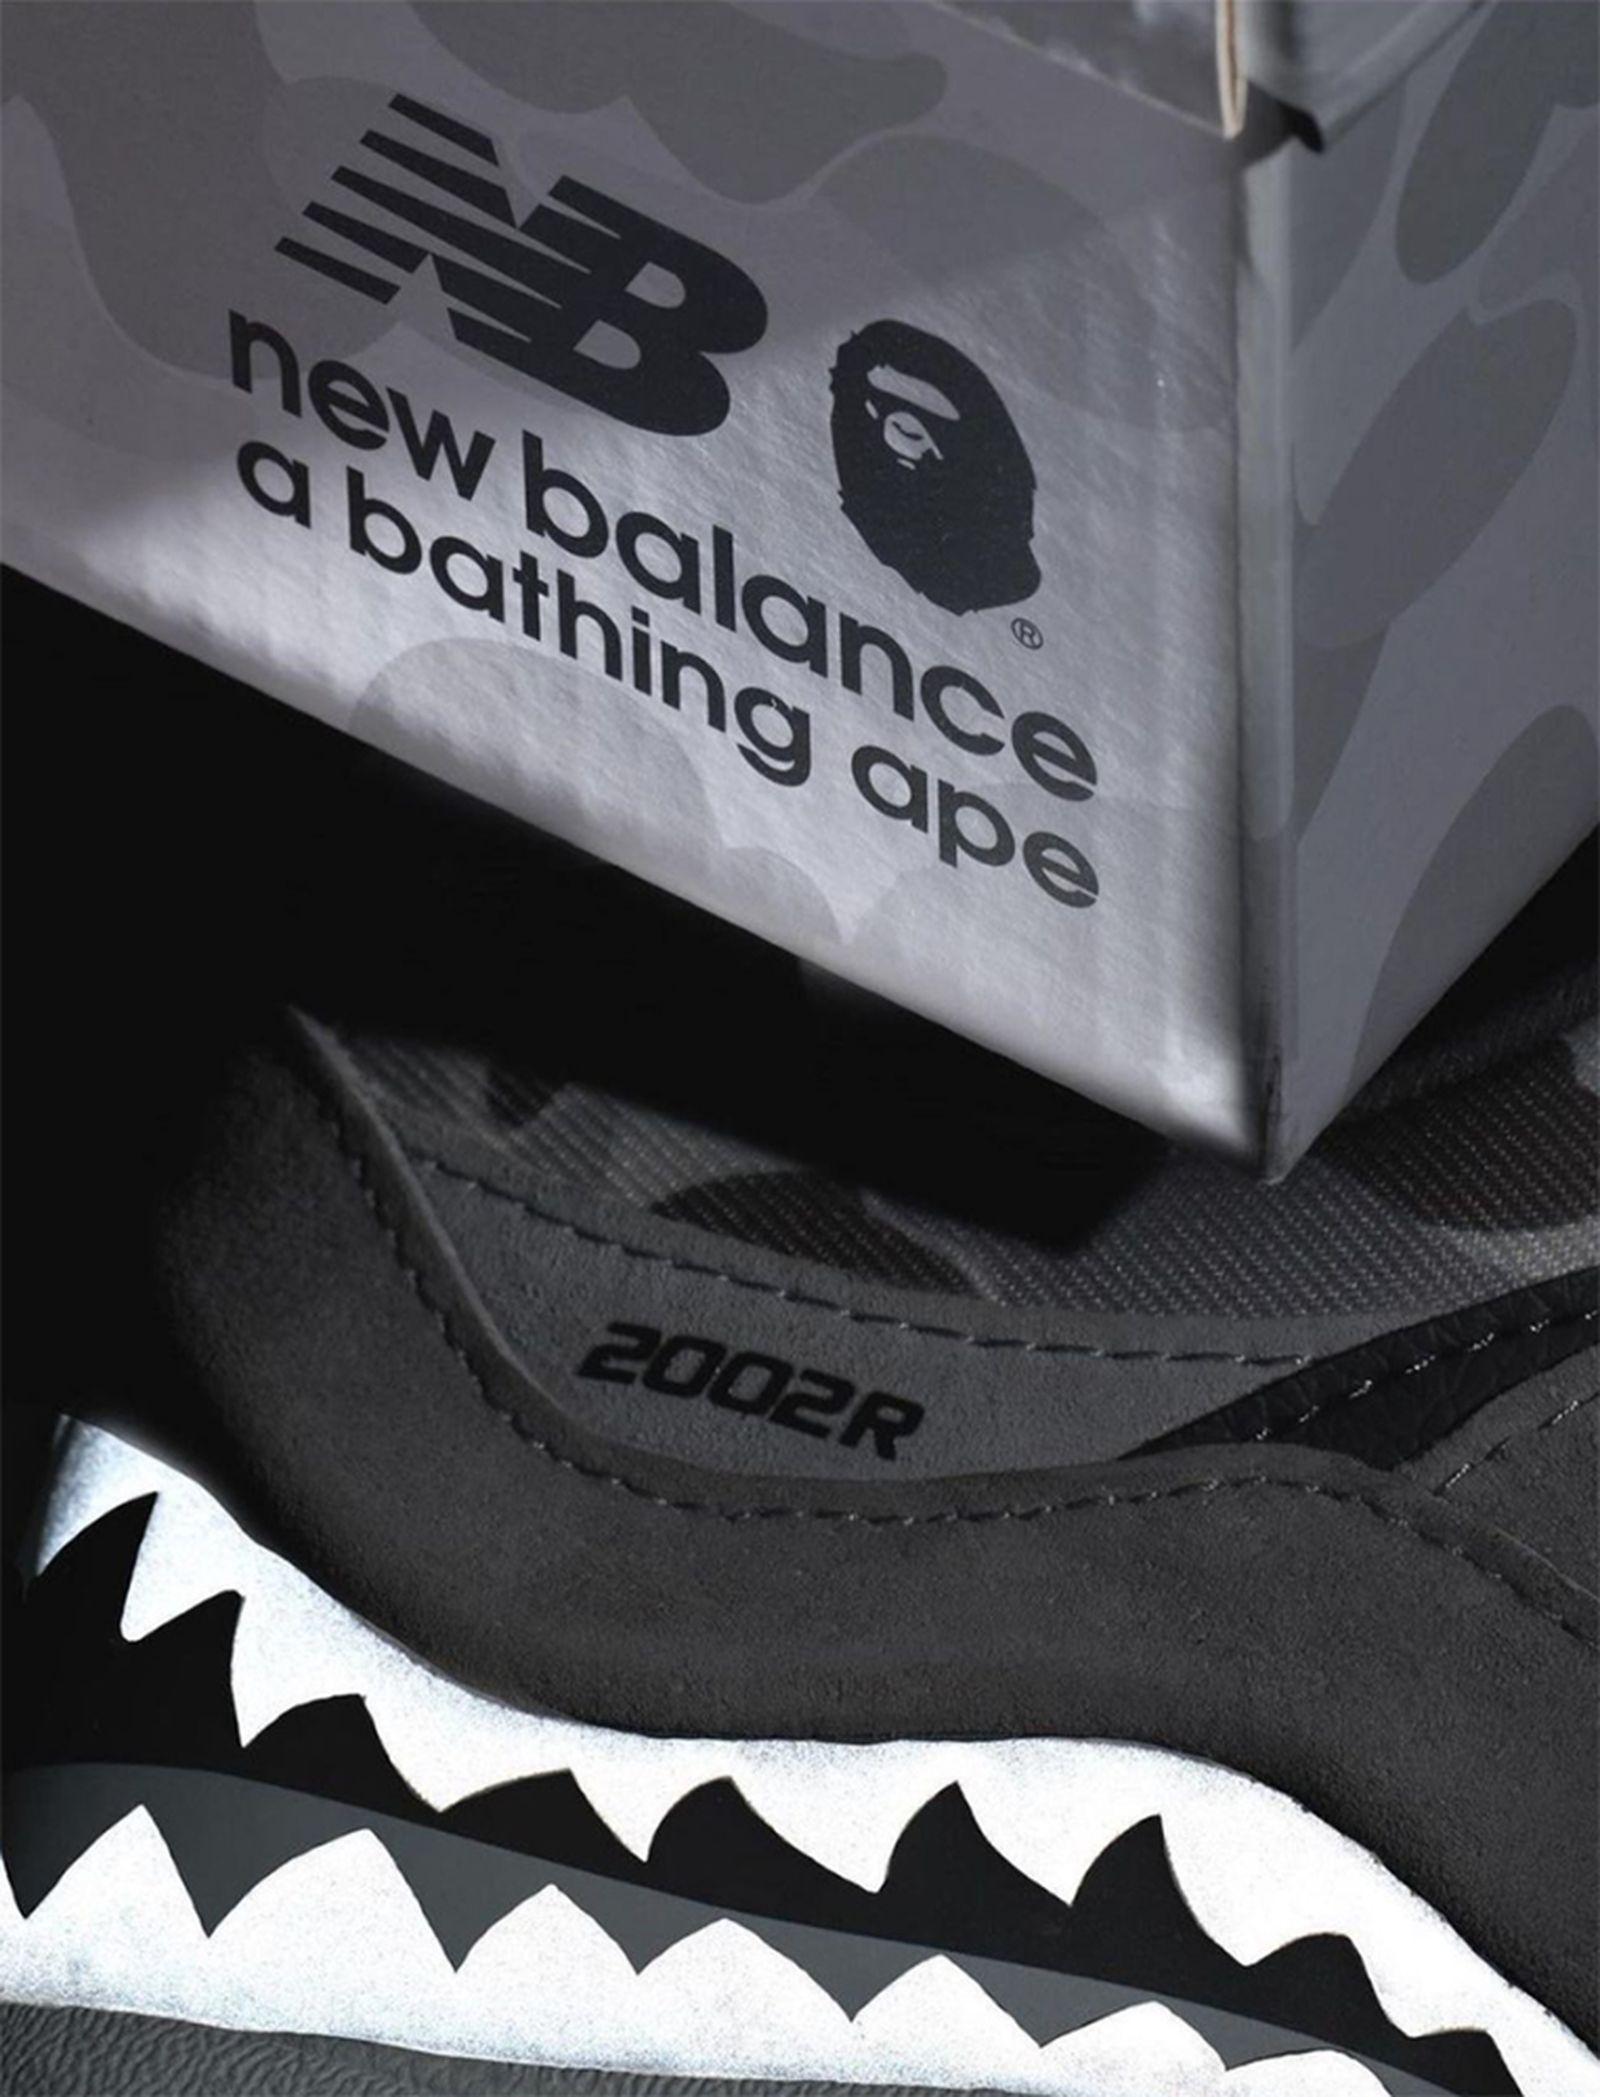 bape-new-balance-2002r-release-date-price-03